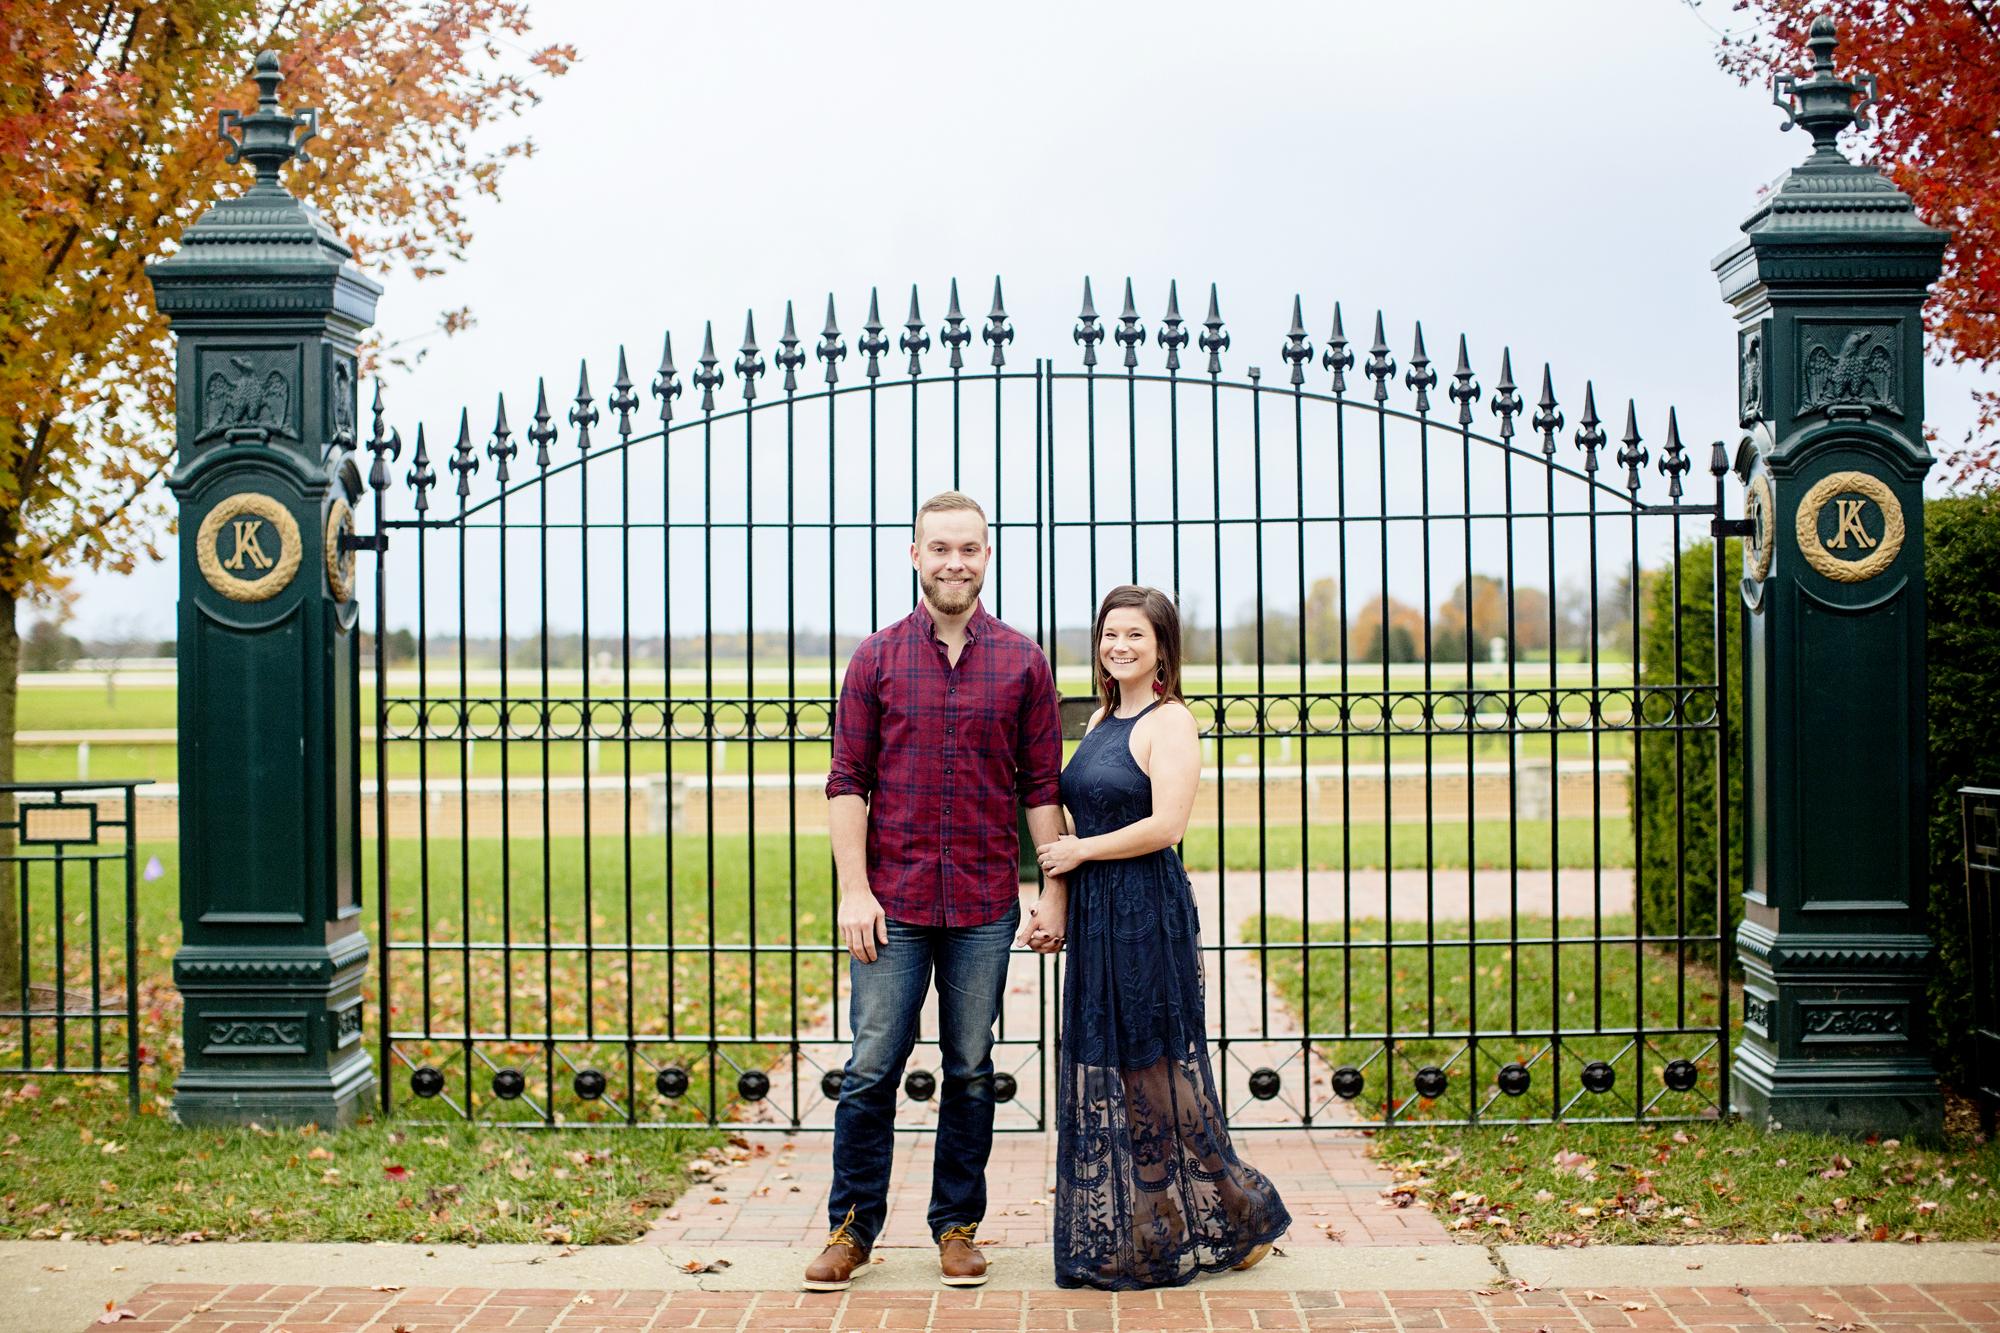 Seriously_Sabrina_Photography_Lexington_Kentucky_Country_Roads_Eckert_Boyd_Pisgah_Keeneland_Engagement_SethRachel_29.jpg